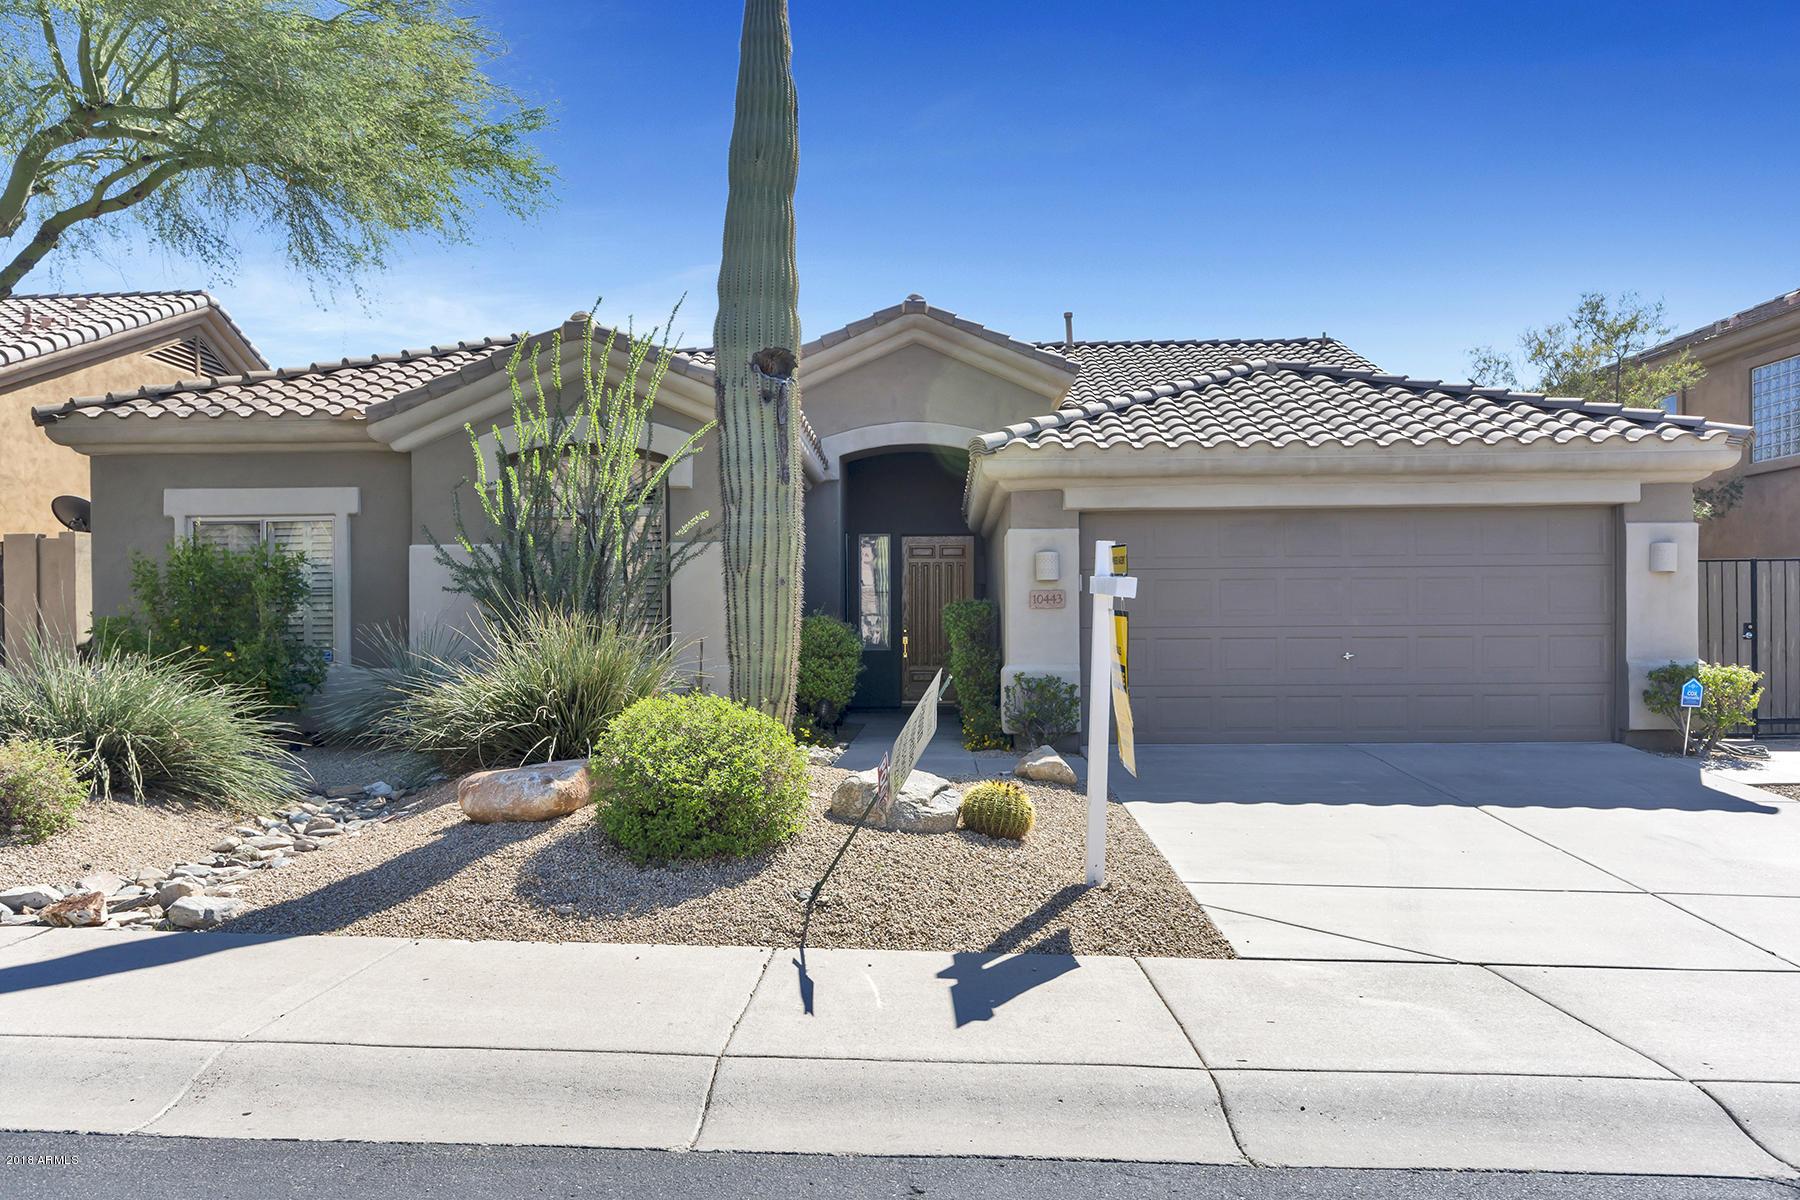 Photo of 10443 E Sheena Drive, Scottsdale, AZ 85255